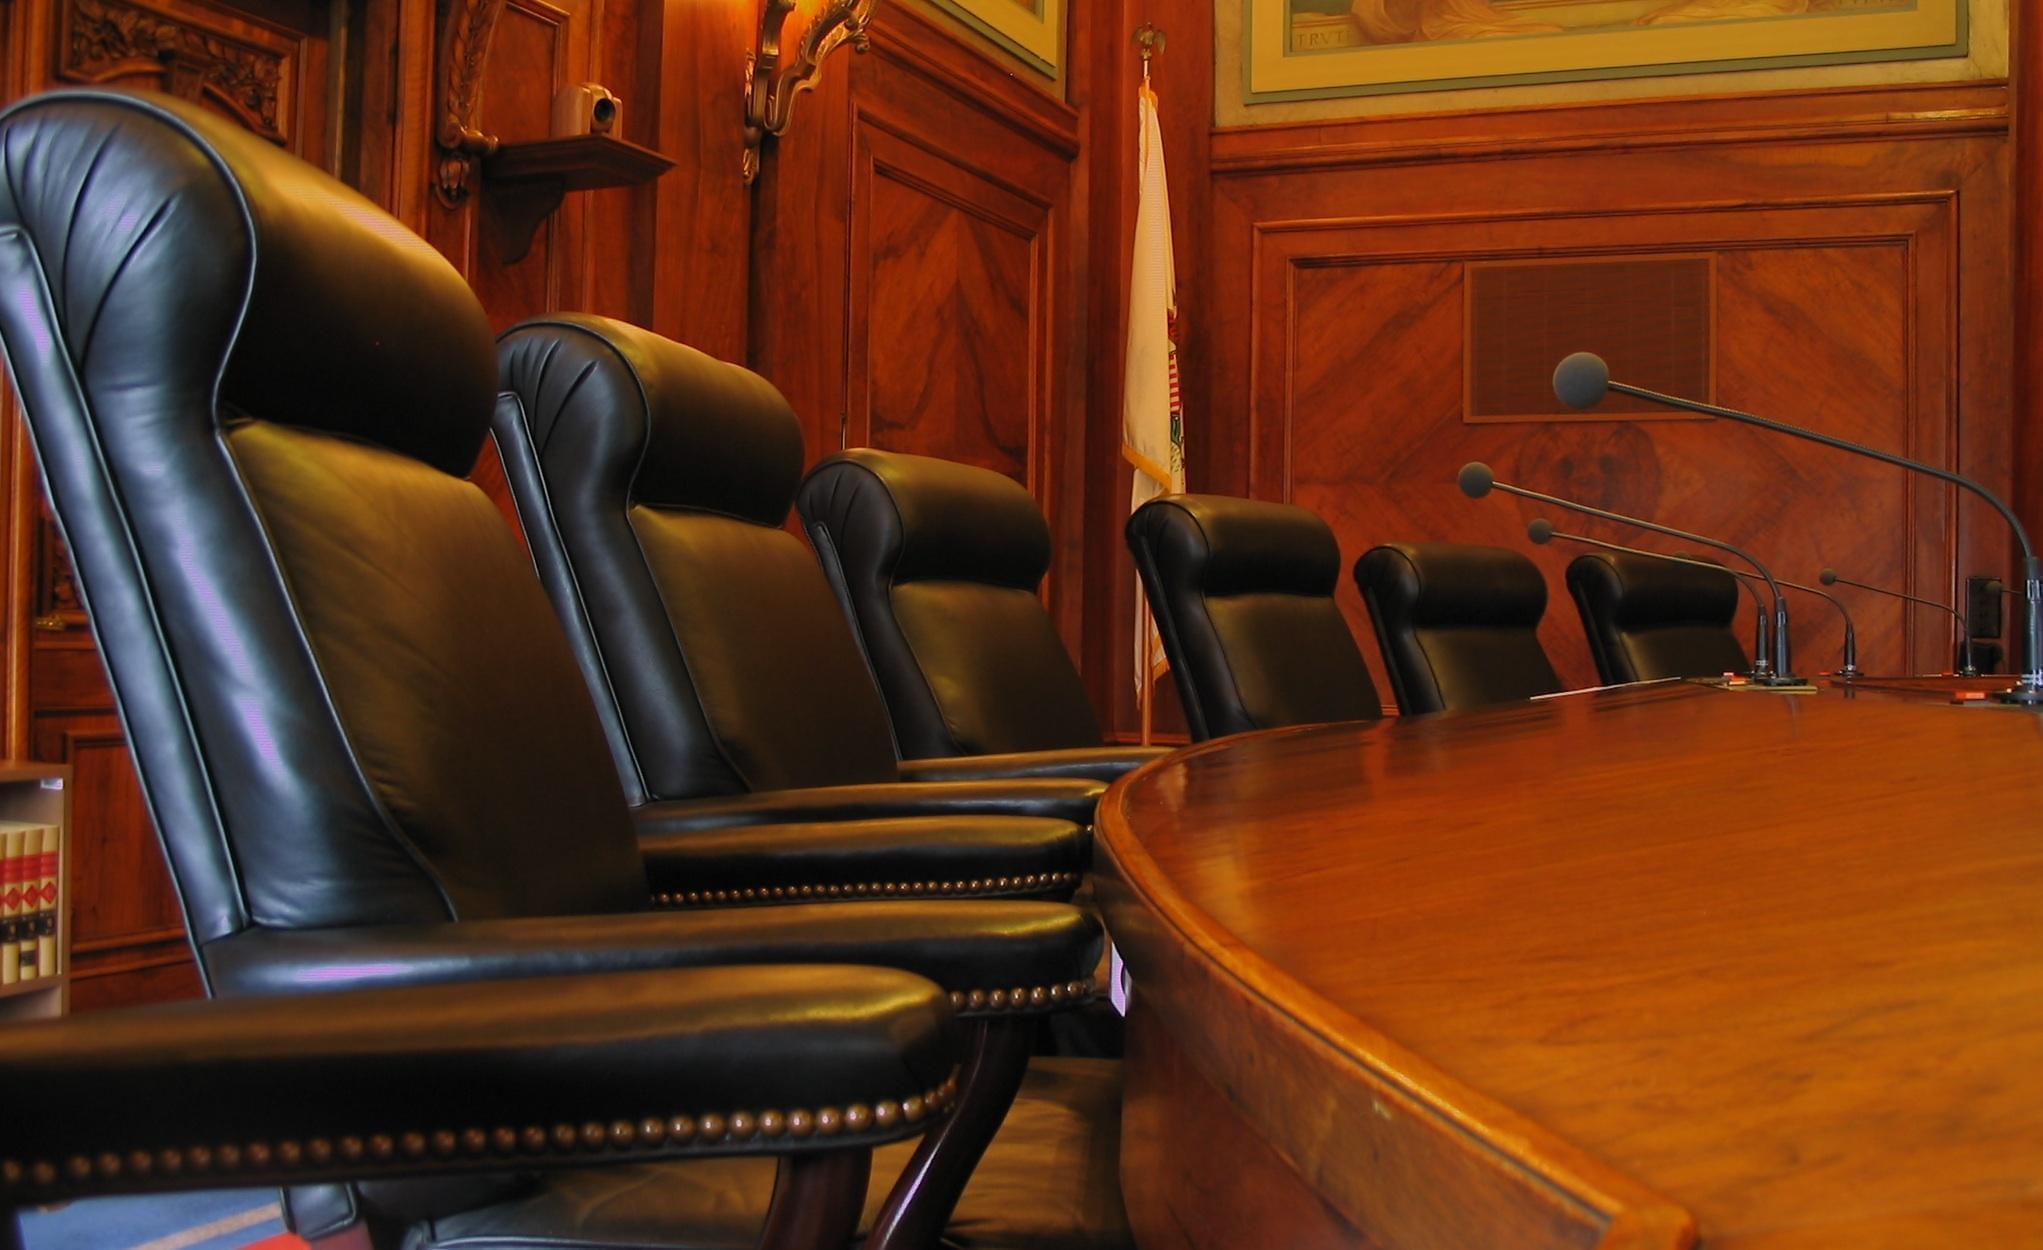 Illinois Supreme Court chambers